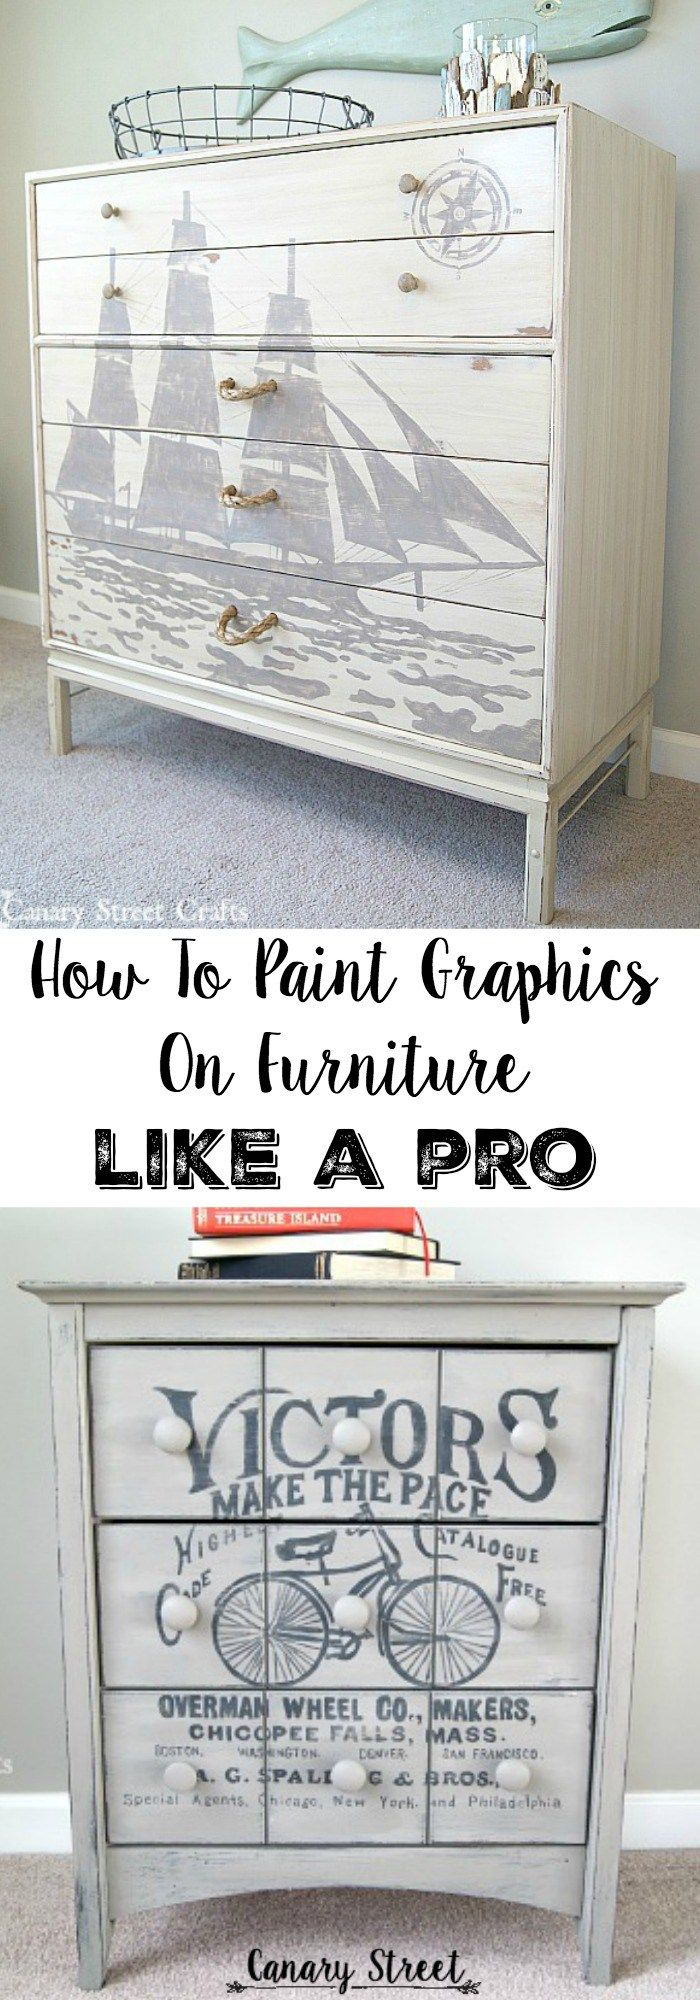 Faux painting furniture ideas - Best 25 Furniture Painting Techniques Ideas On Pinterest Chalk Painting Furniture Chalkboard Paint Furniture And Chalk Paint Diy